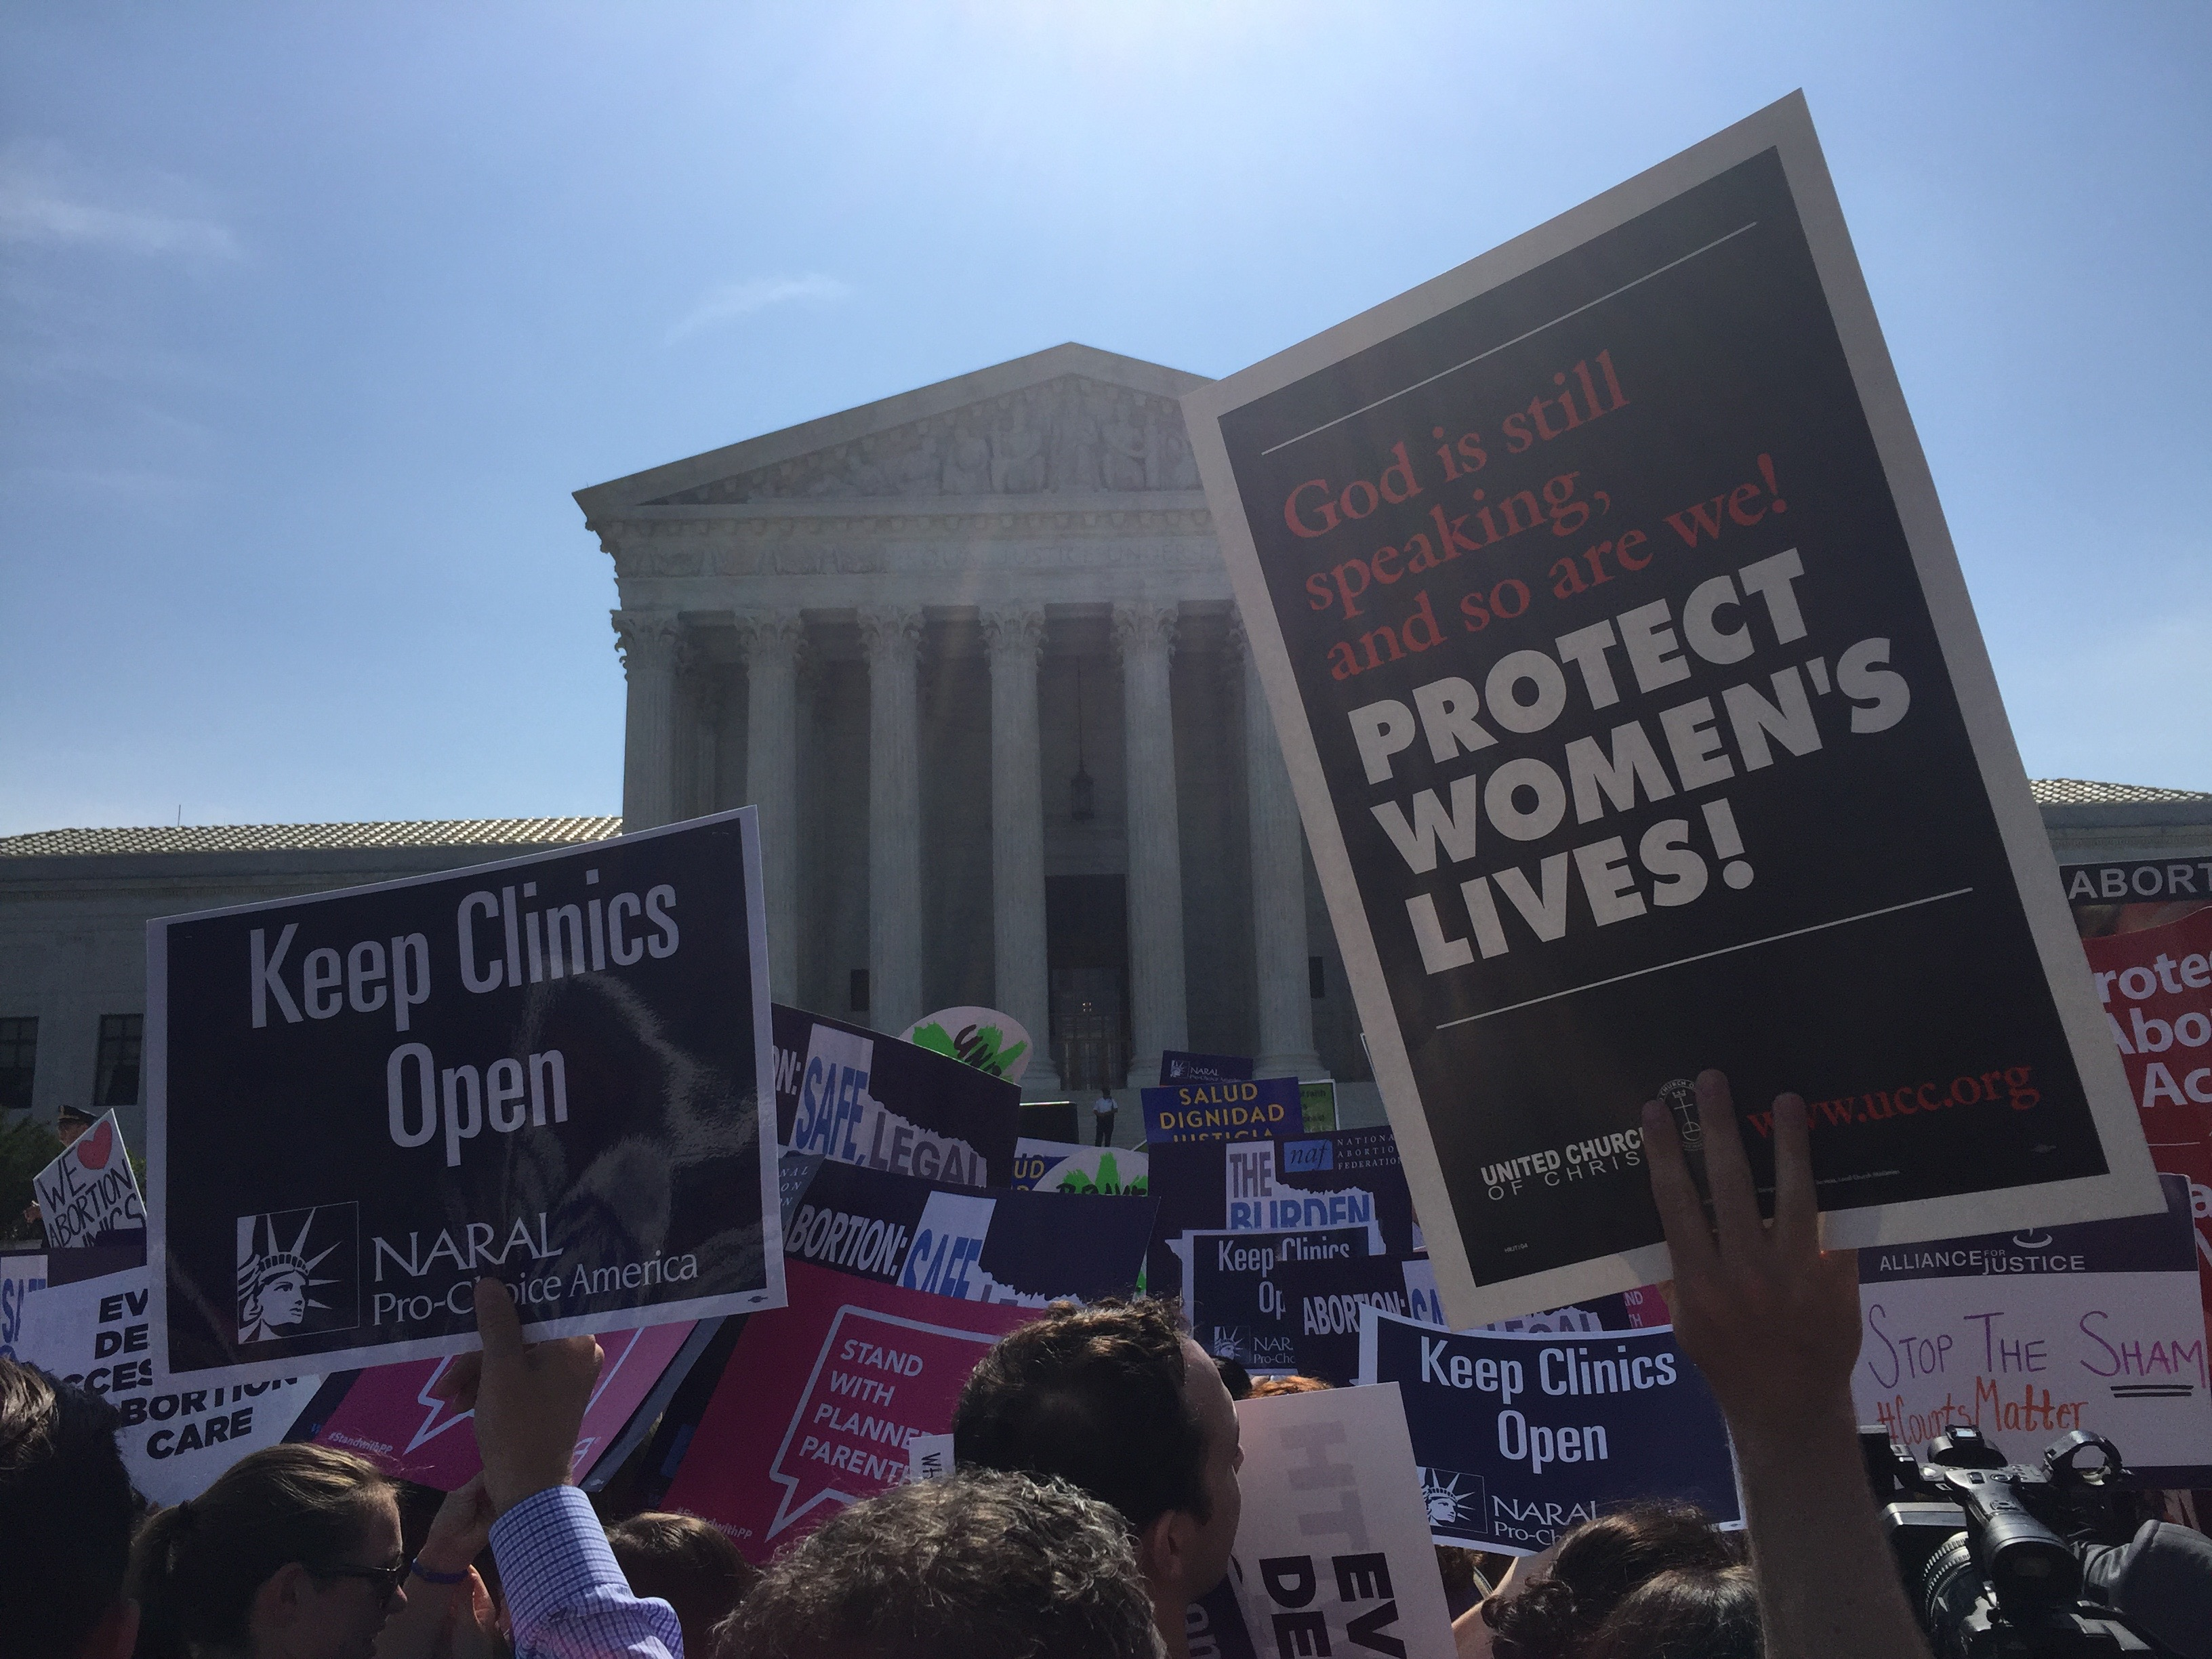 Abortion_Sign_1.jpg